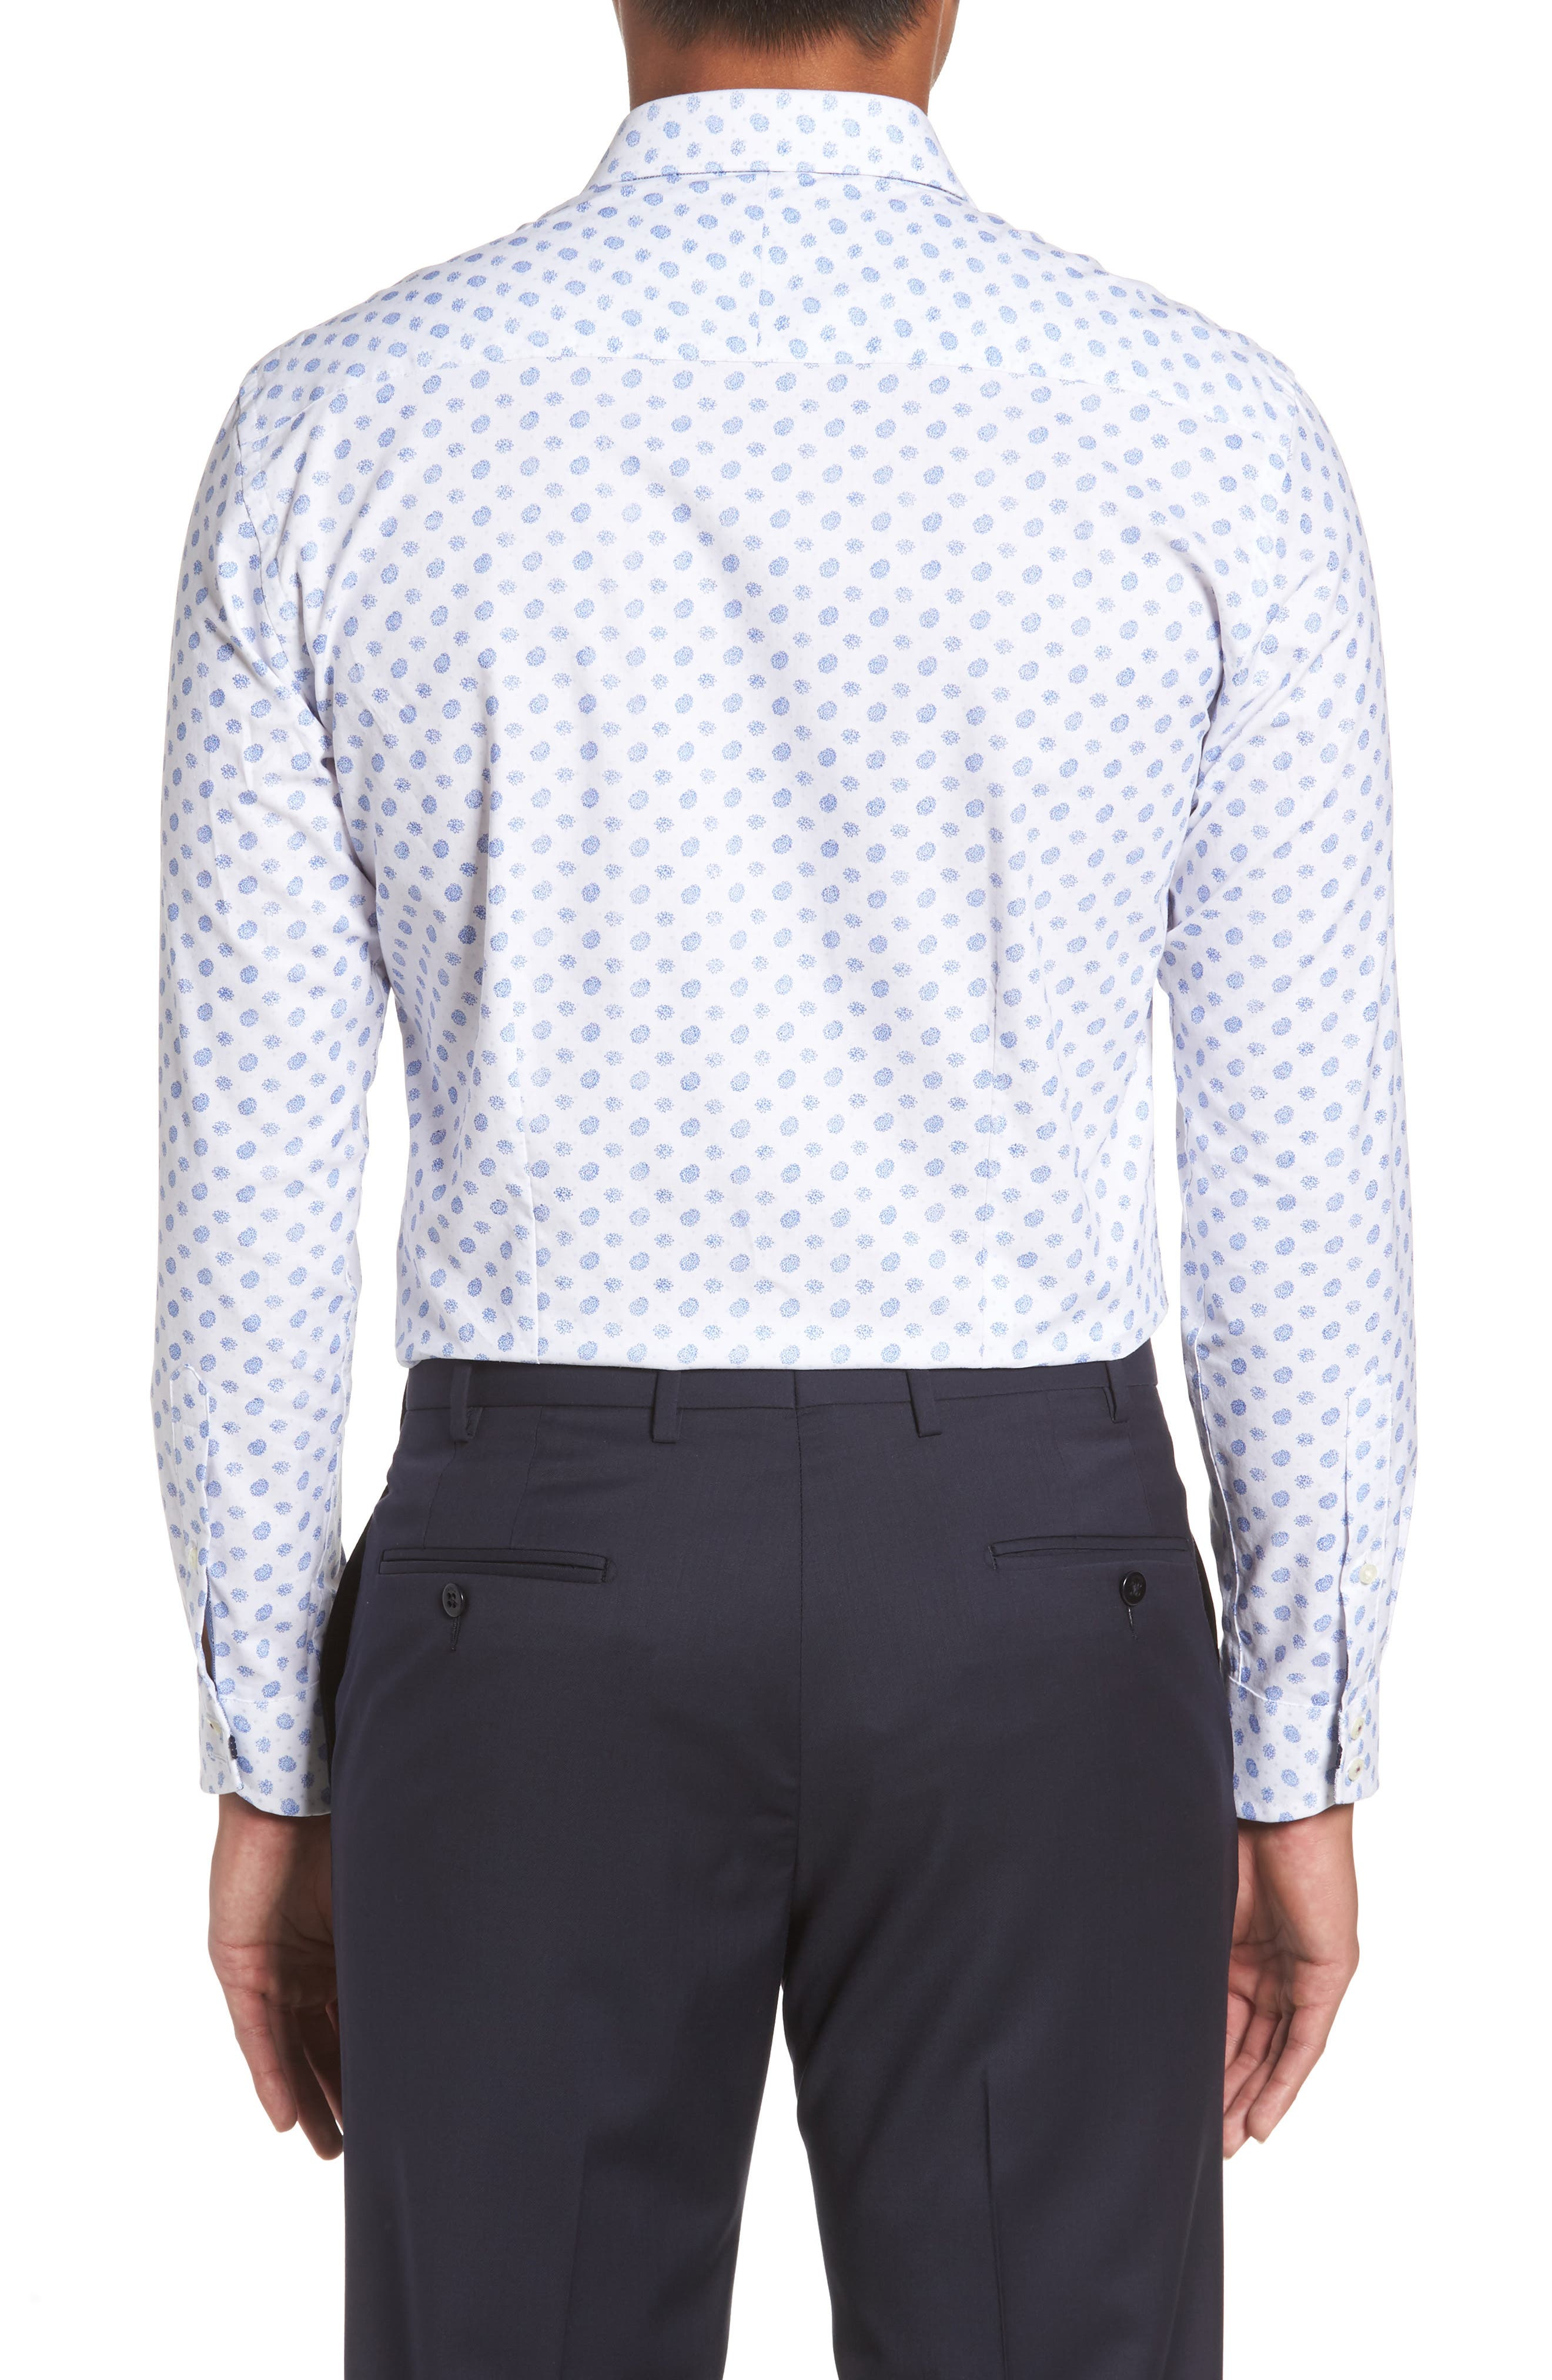 Midra Trim Fit Paisley Dress Shirt,                             Alternate thumbnail 2, color,                             110